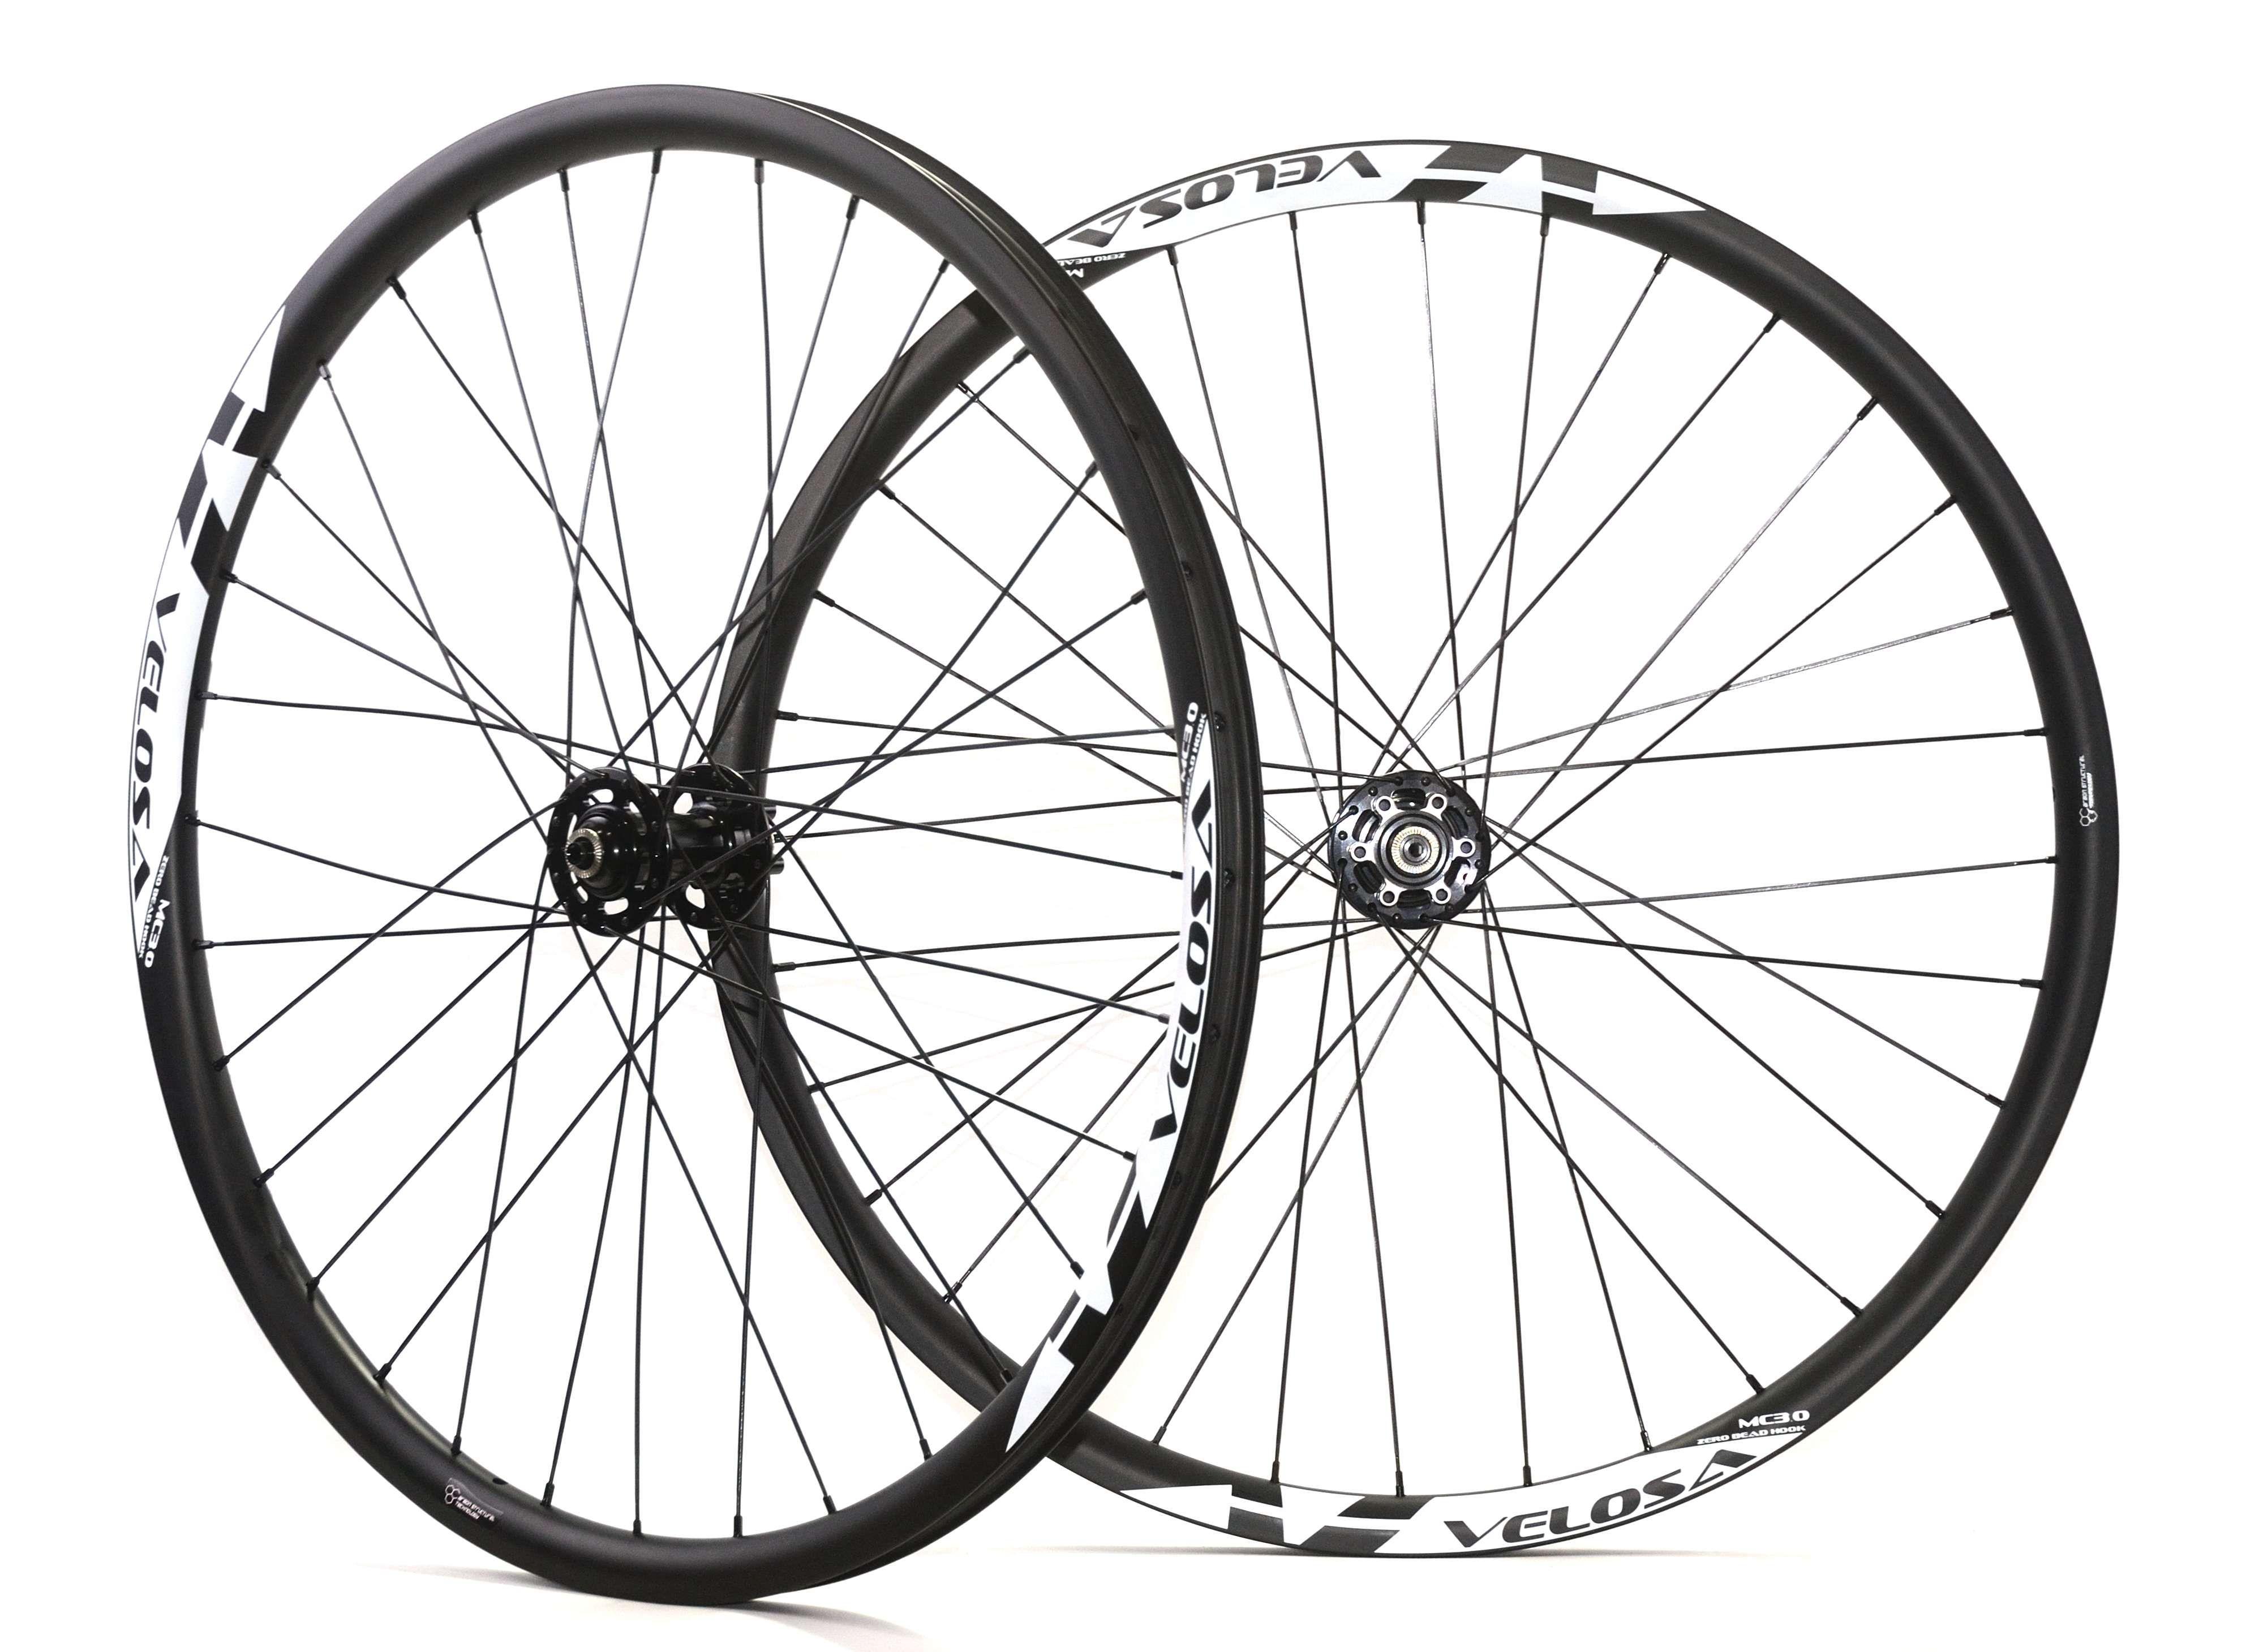 Velosa 29 inç MTB karbon tekerlek, 29er karbon MTB AM / DH tekerlekler, Thru aks hub, dağ bisikleti tekerlek kancasız jant tubeless uyumlu